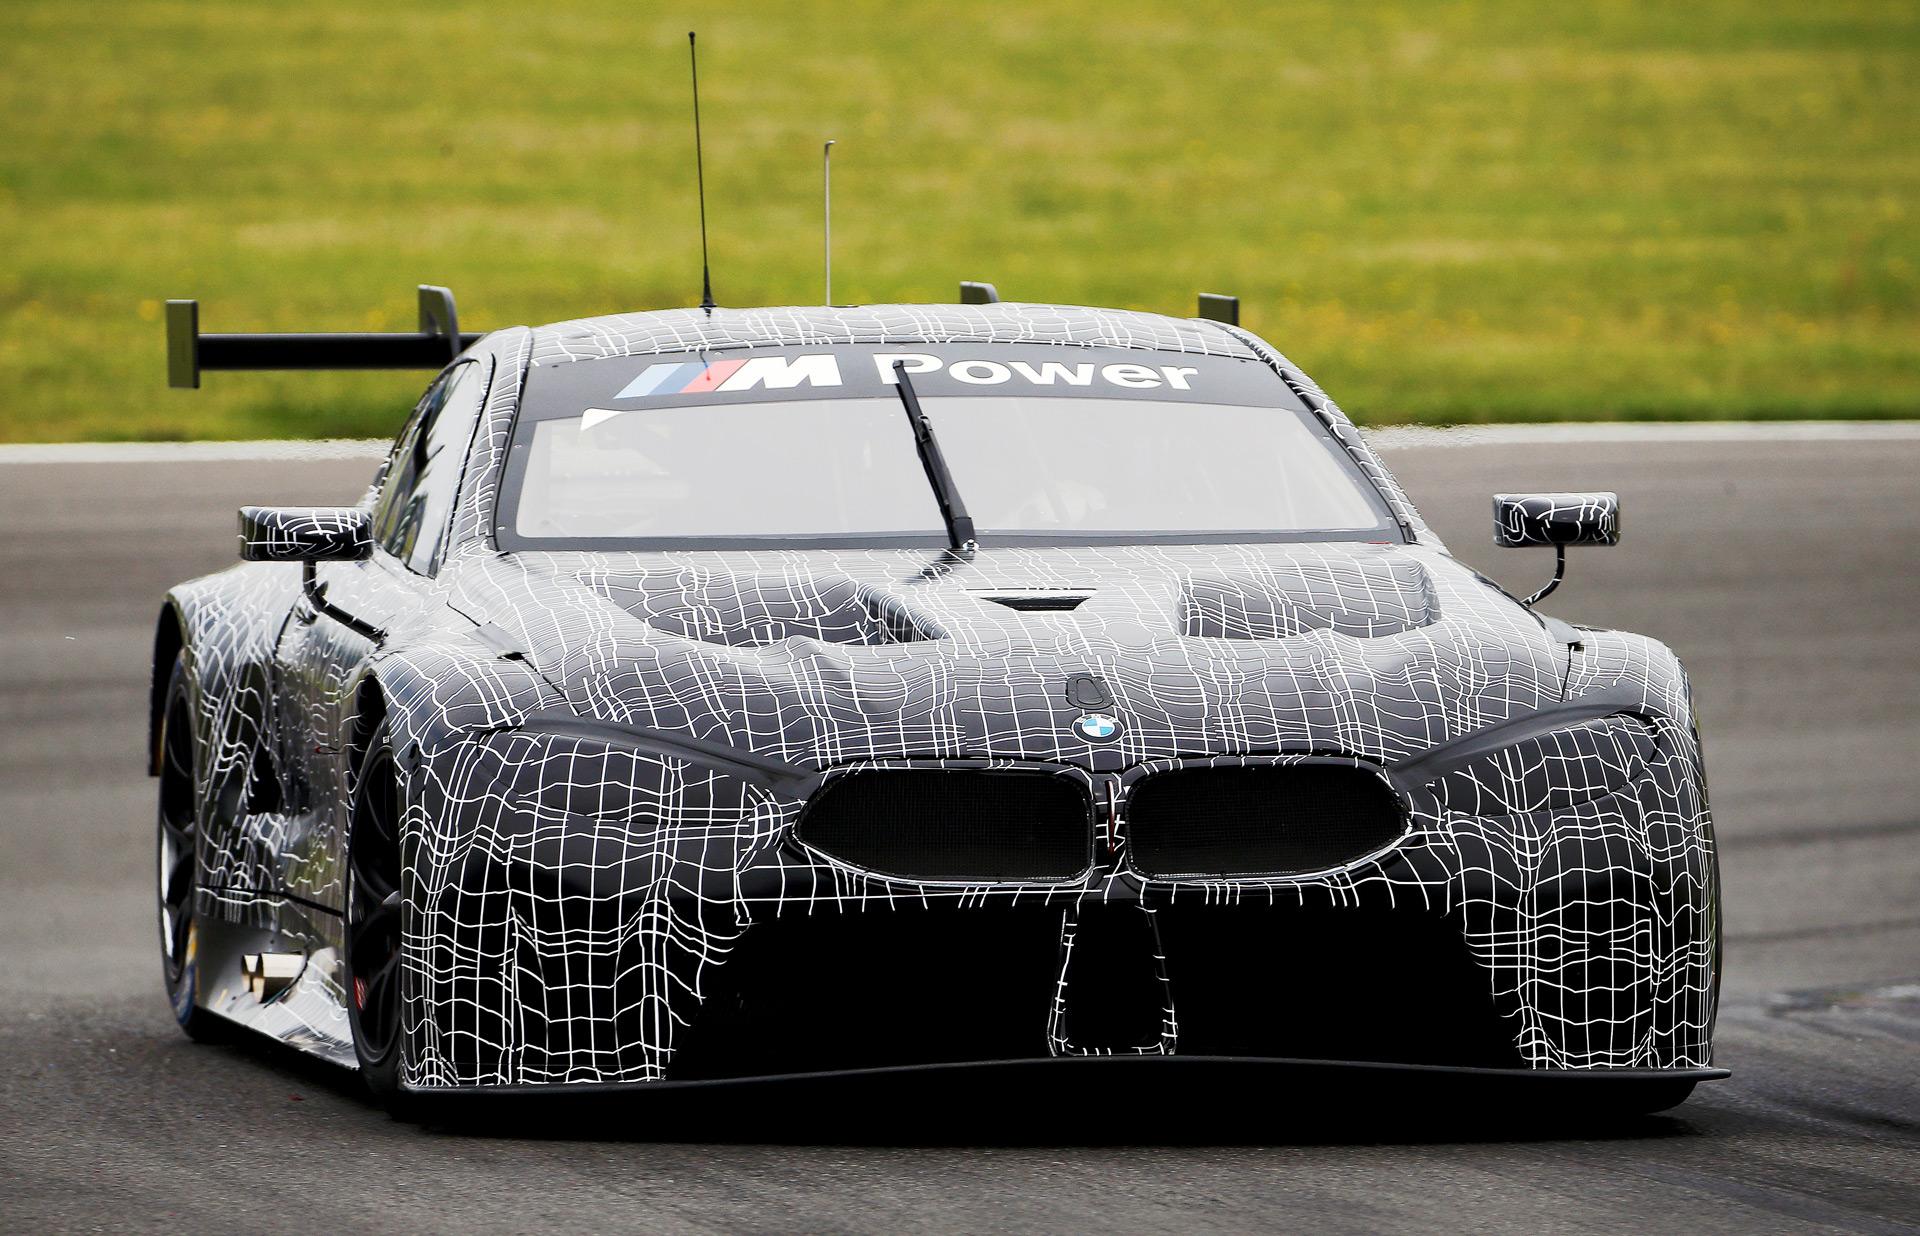 BMW M8 GTE, Buick Regal GS, Porsche 718 Boxster GTS: Today ...